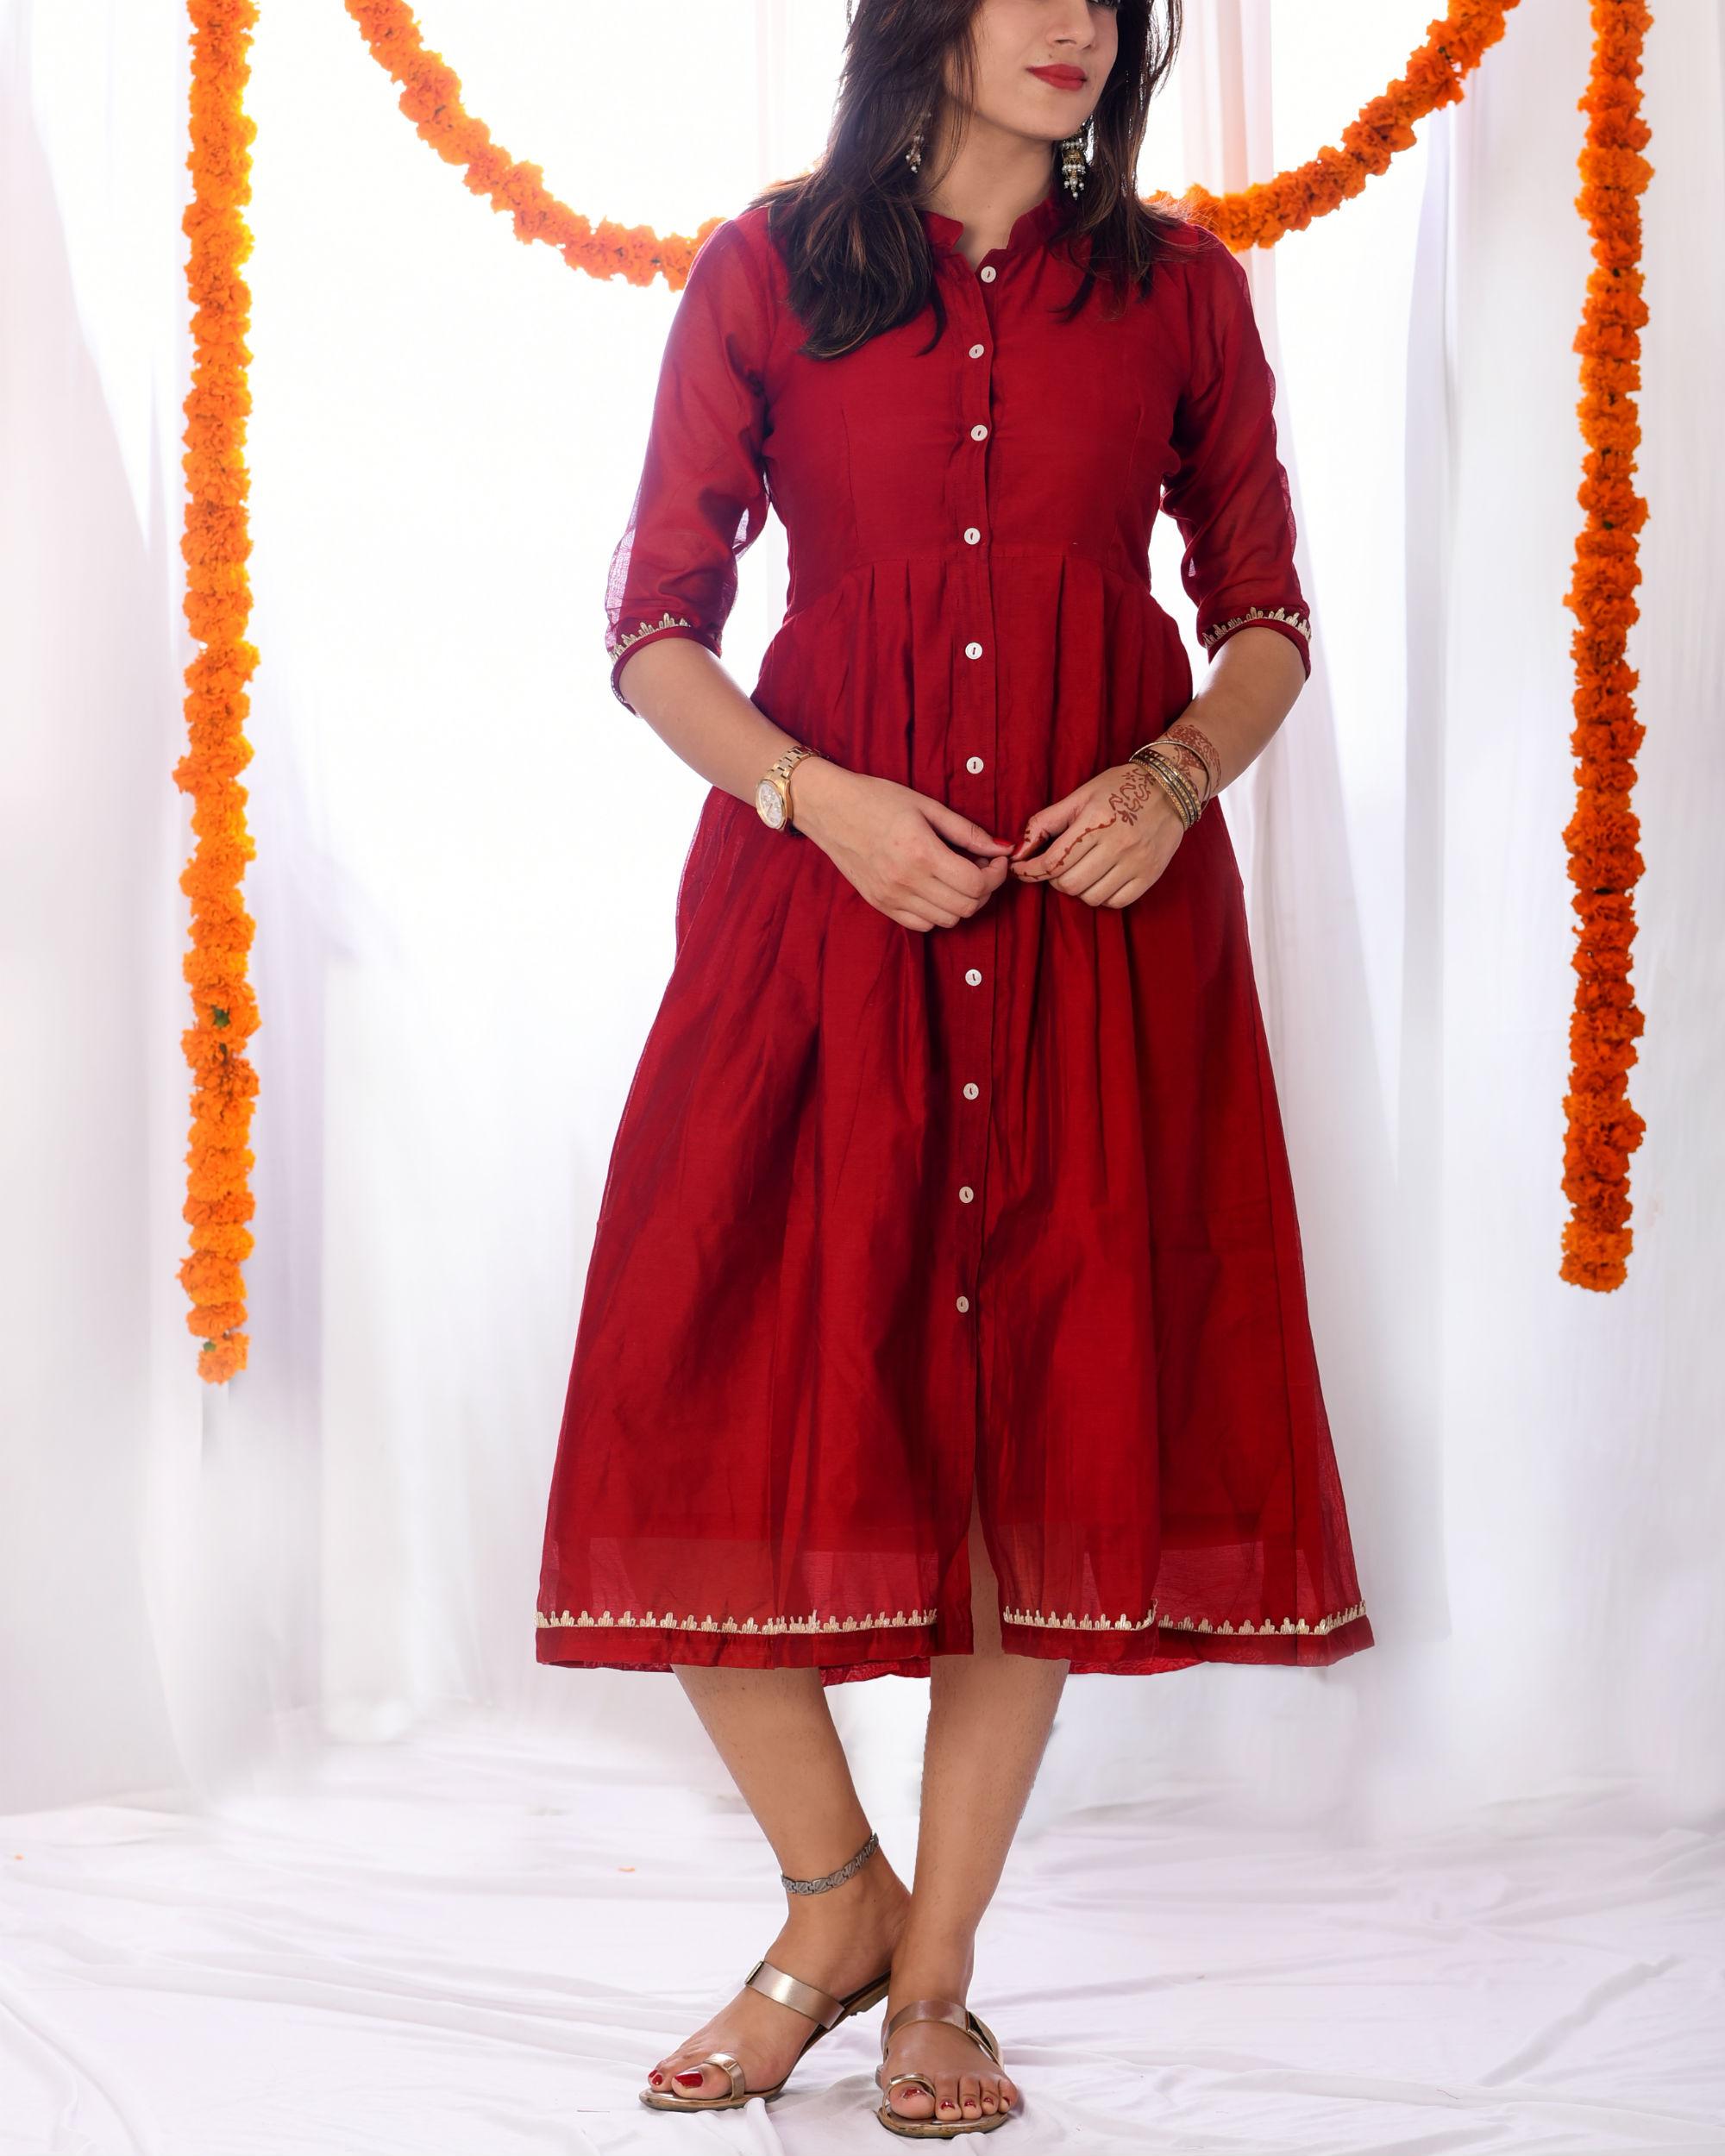 Red knife pleat dress